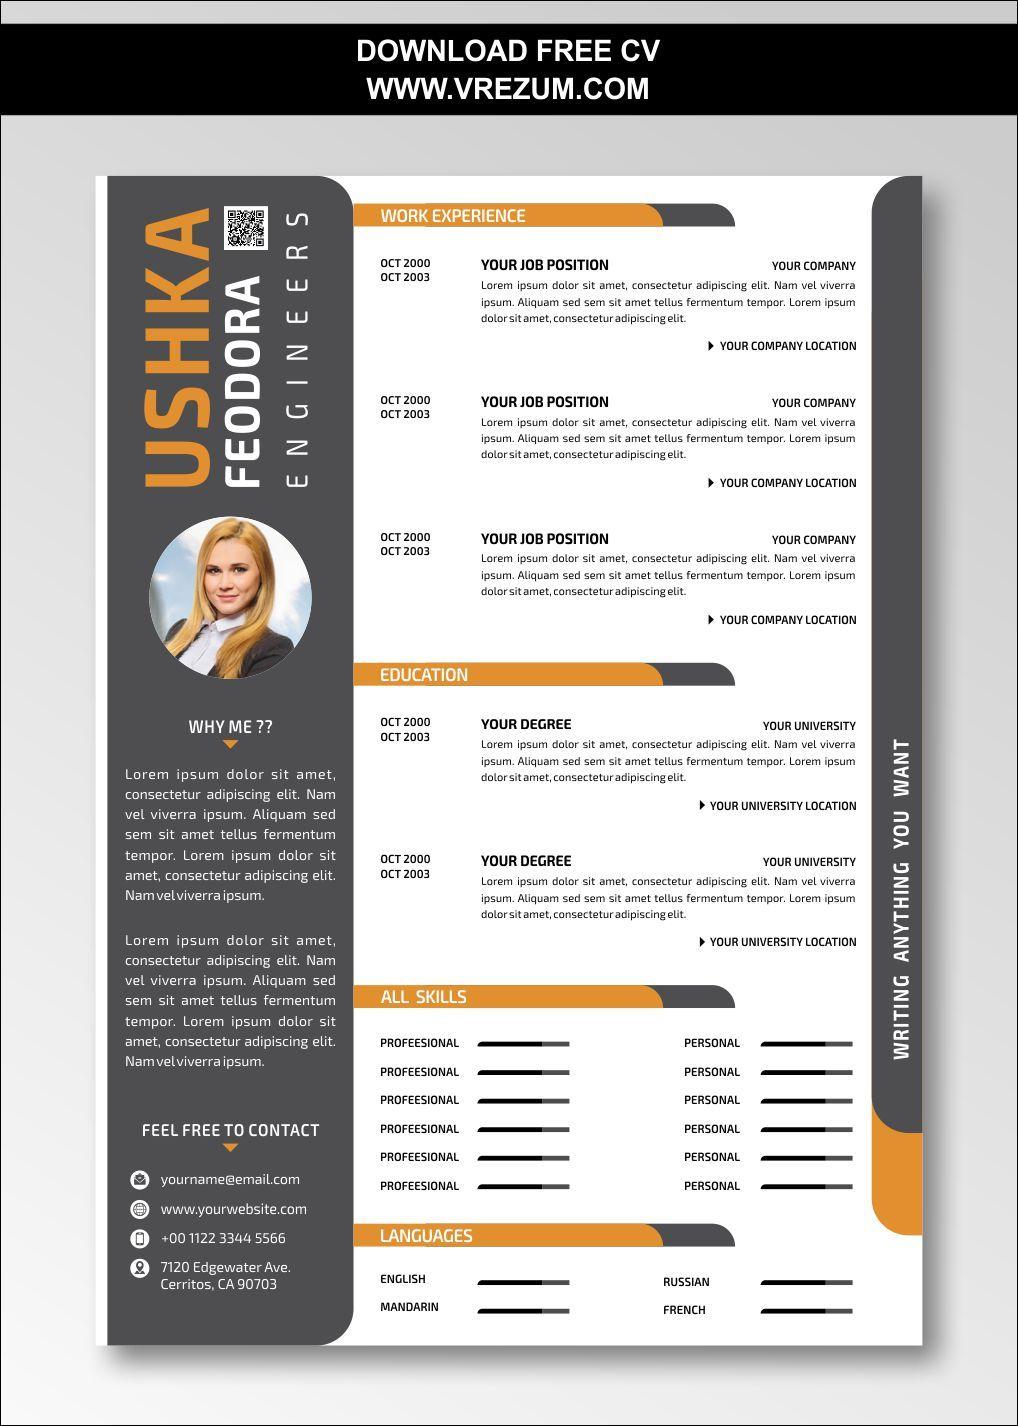 Editable Free Cv Templates For Fresh Graduate Engineer Cv Template Free Cv Template Creative Cv Template Resume template for fresh graduate